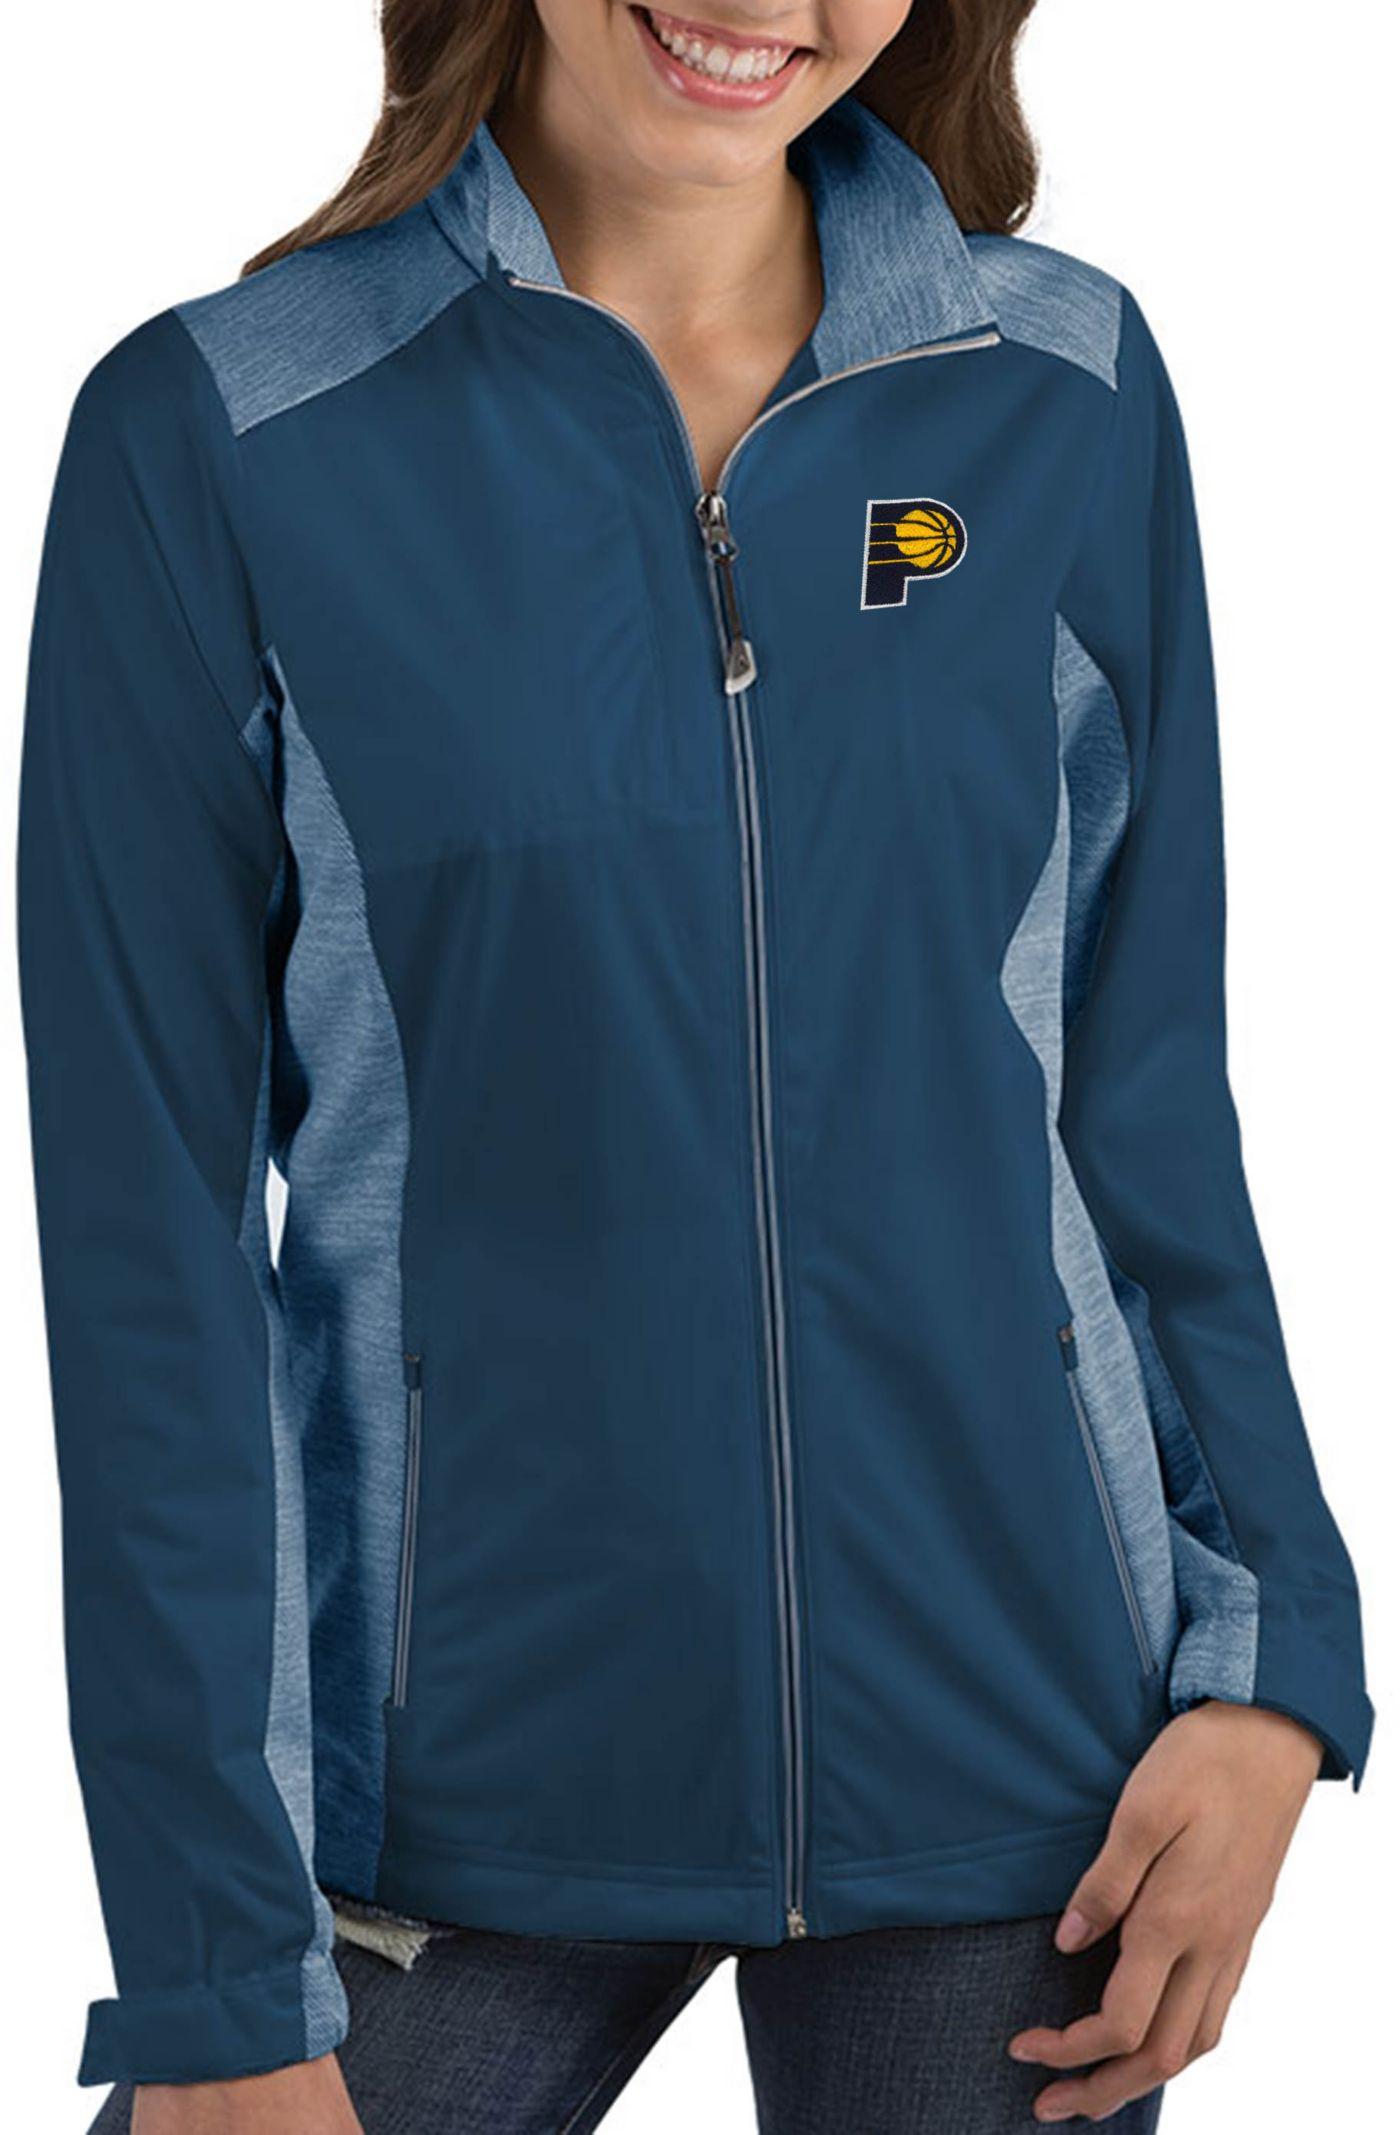 Antigua Women's Indiana Pacers Revolve Full-Zip Jacket